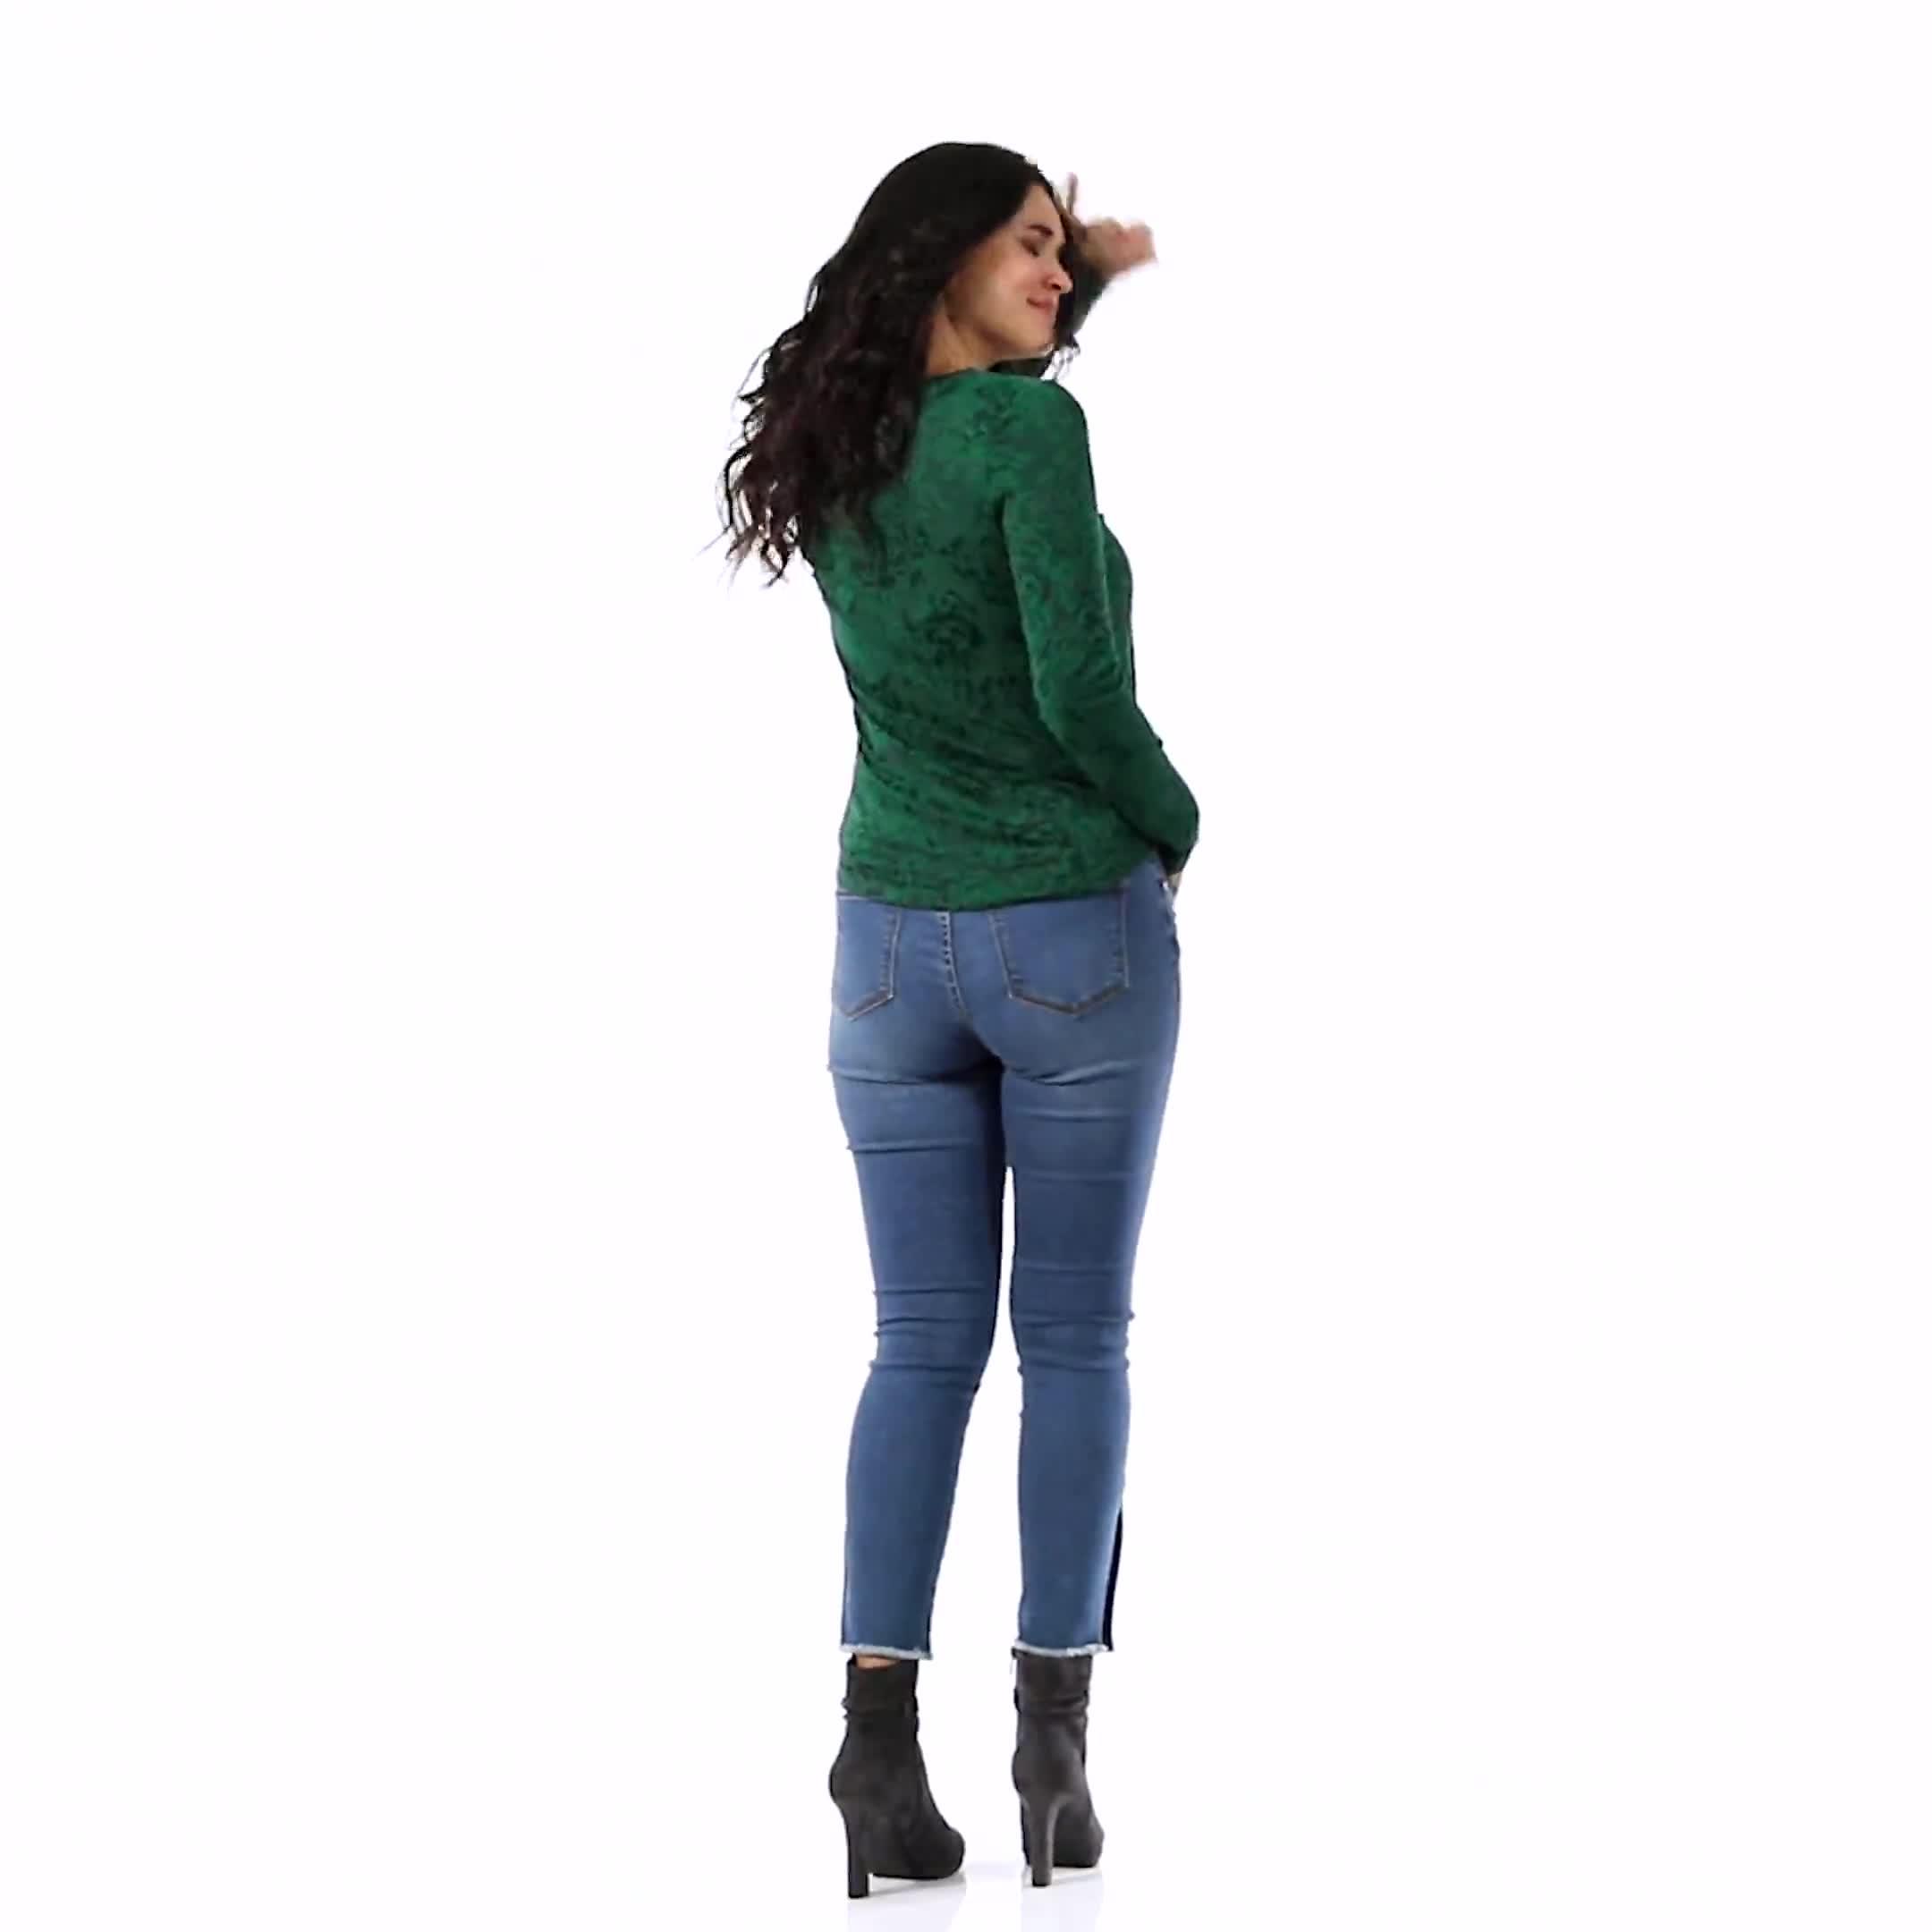 Jacquard Knit Top - Video